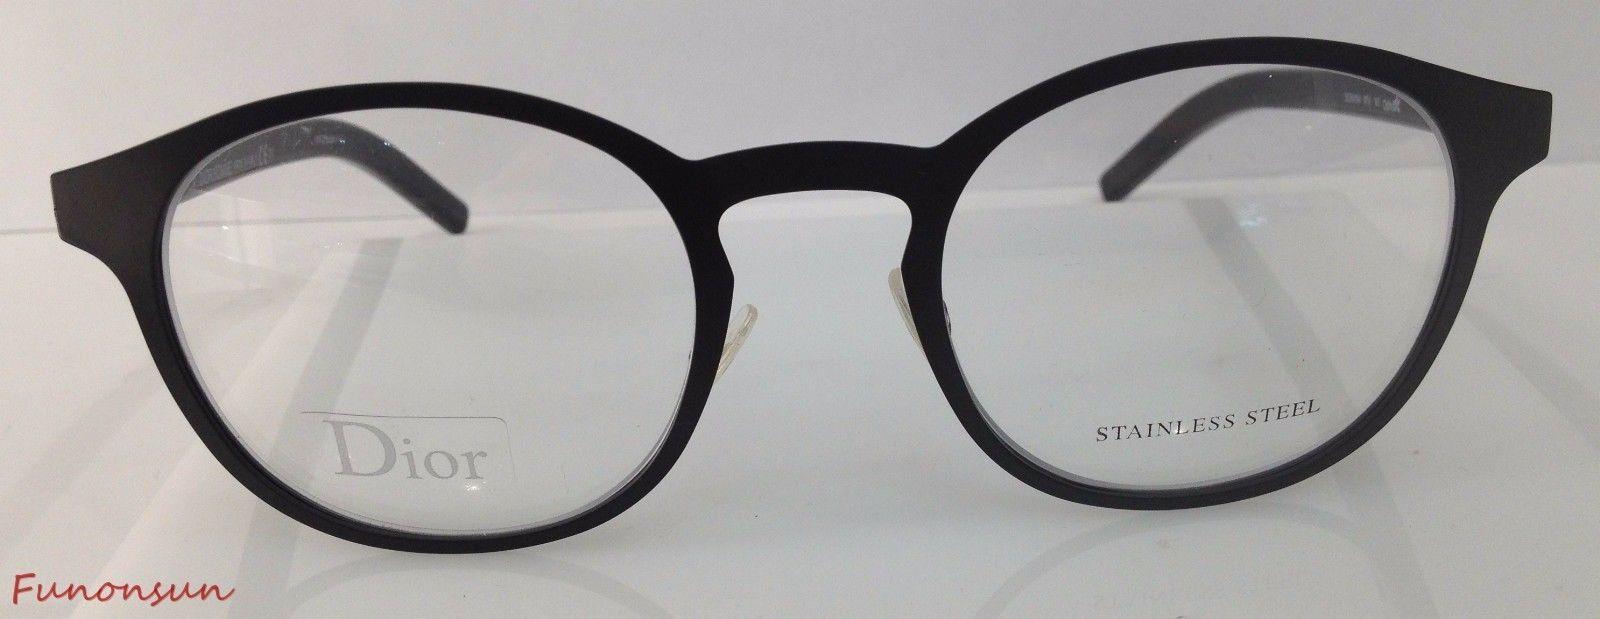 c6f4f9c7cdcfa Christian Dior Homme Unisex Eyeglasses and 50 similar items